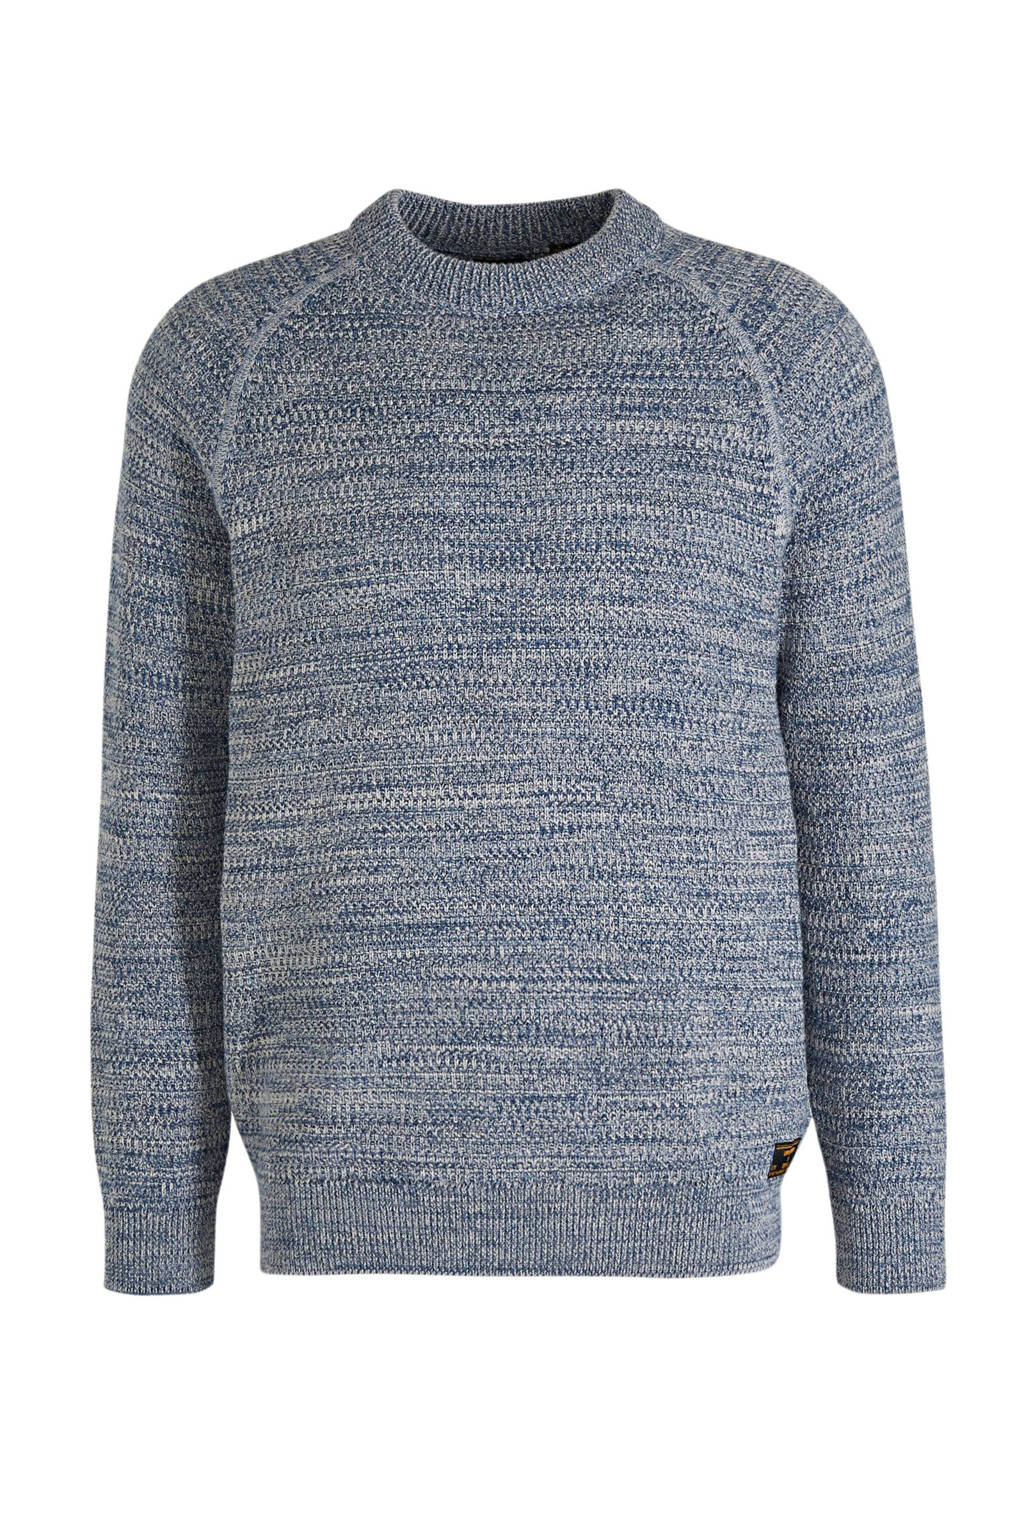 Superdry gemêleerde trui KEYSTONE CREW blauw, Blauw